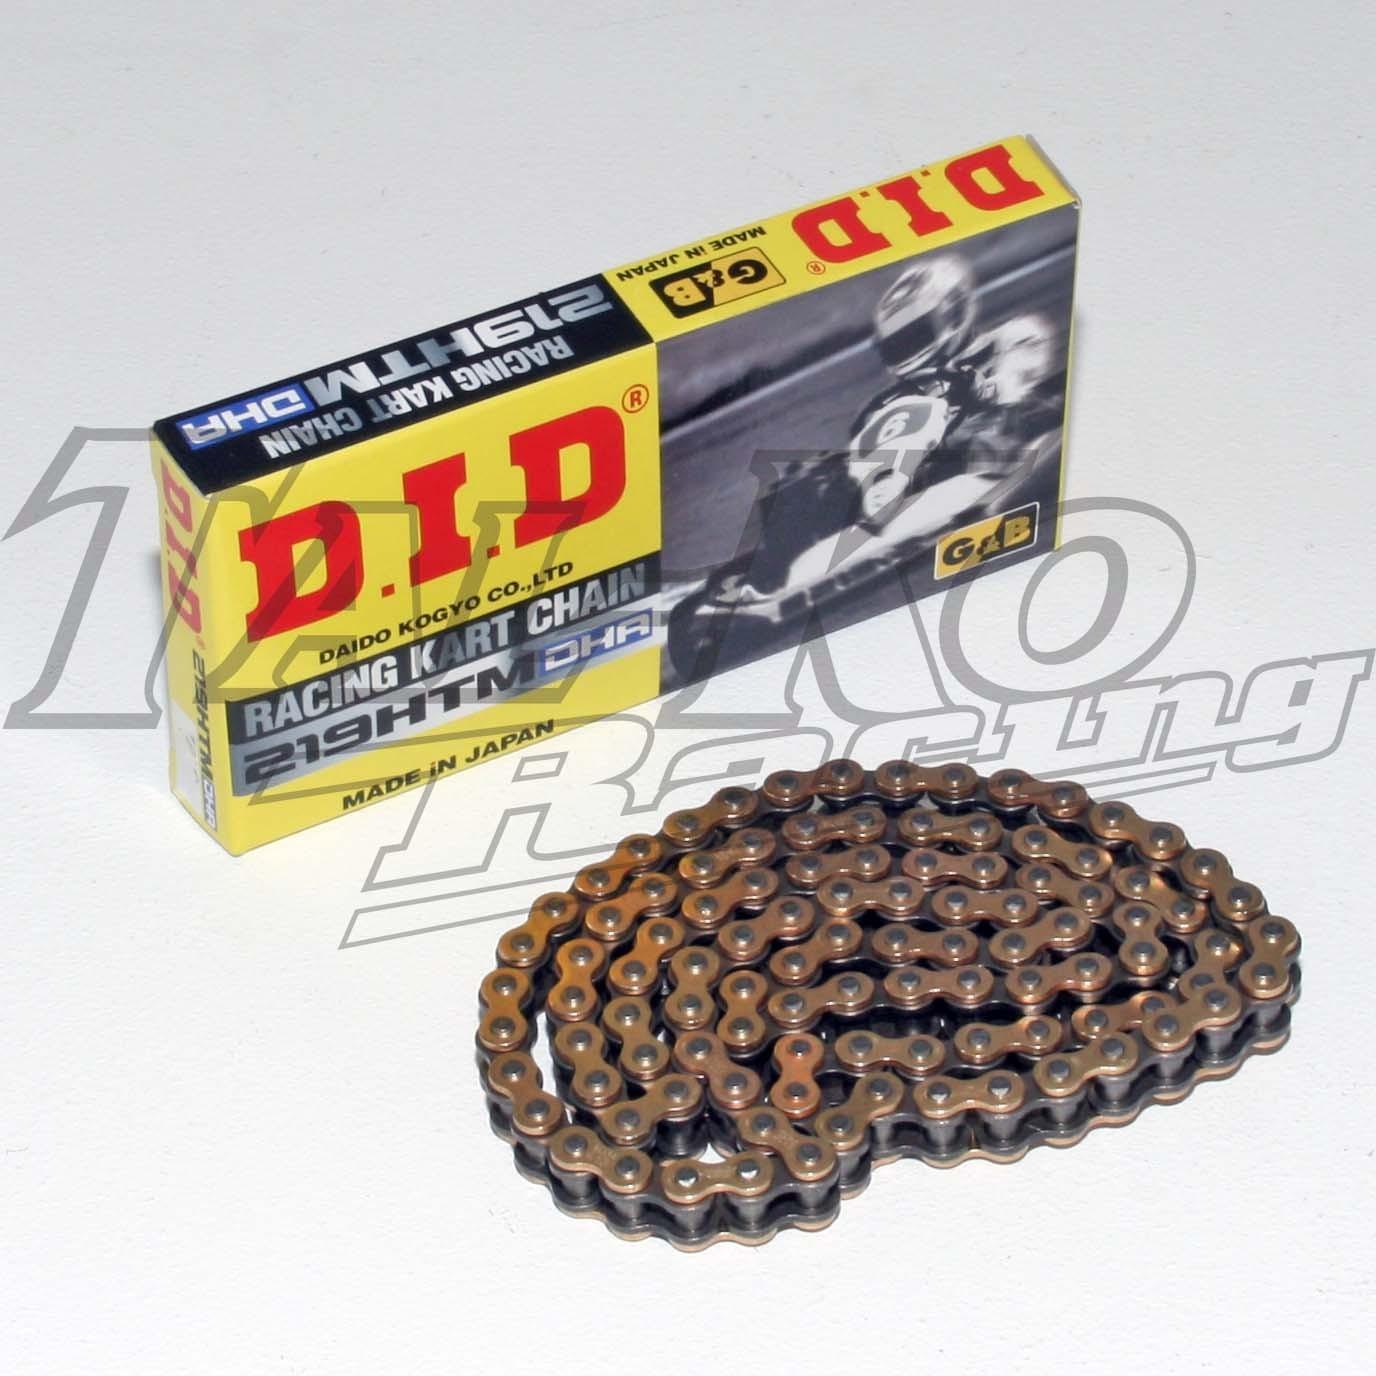 DID 219 CHAIN GOLD BLACK DHA 112L